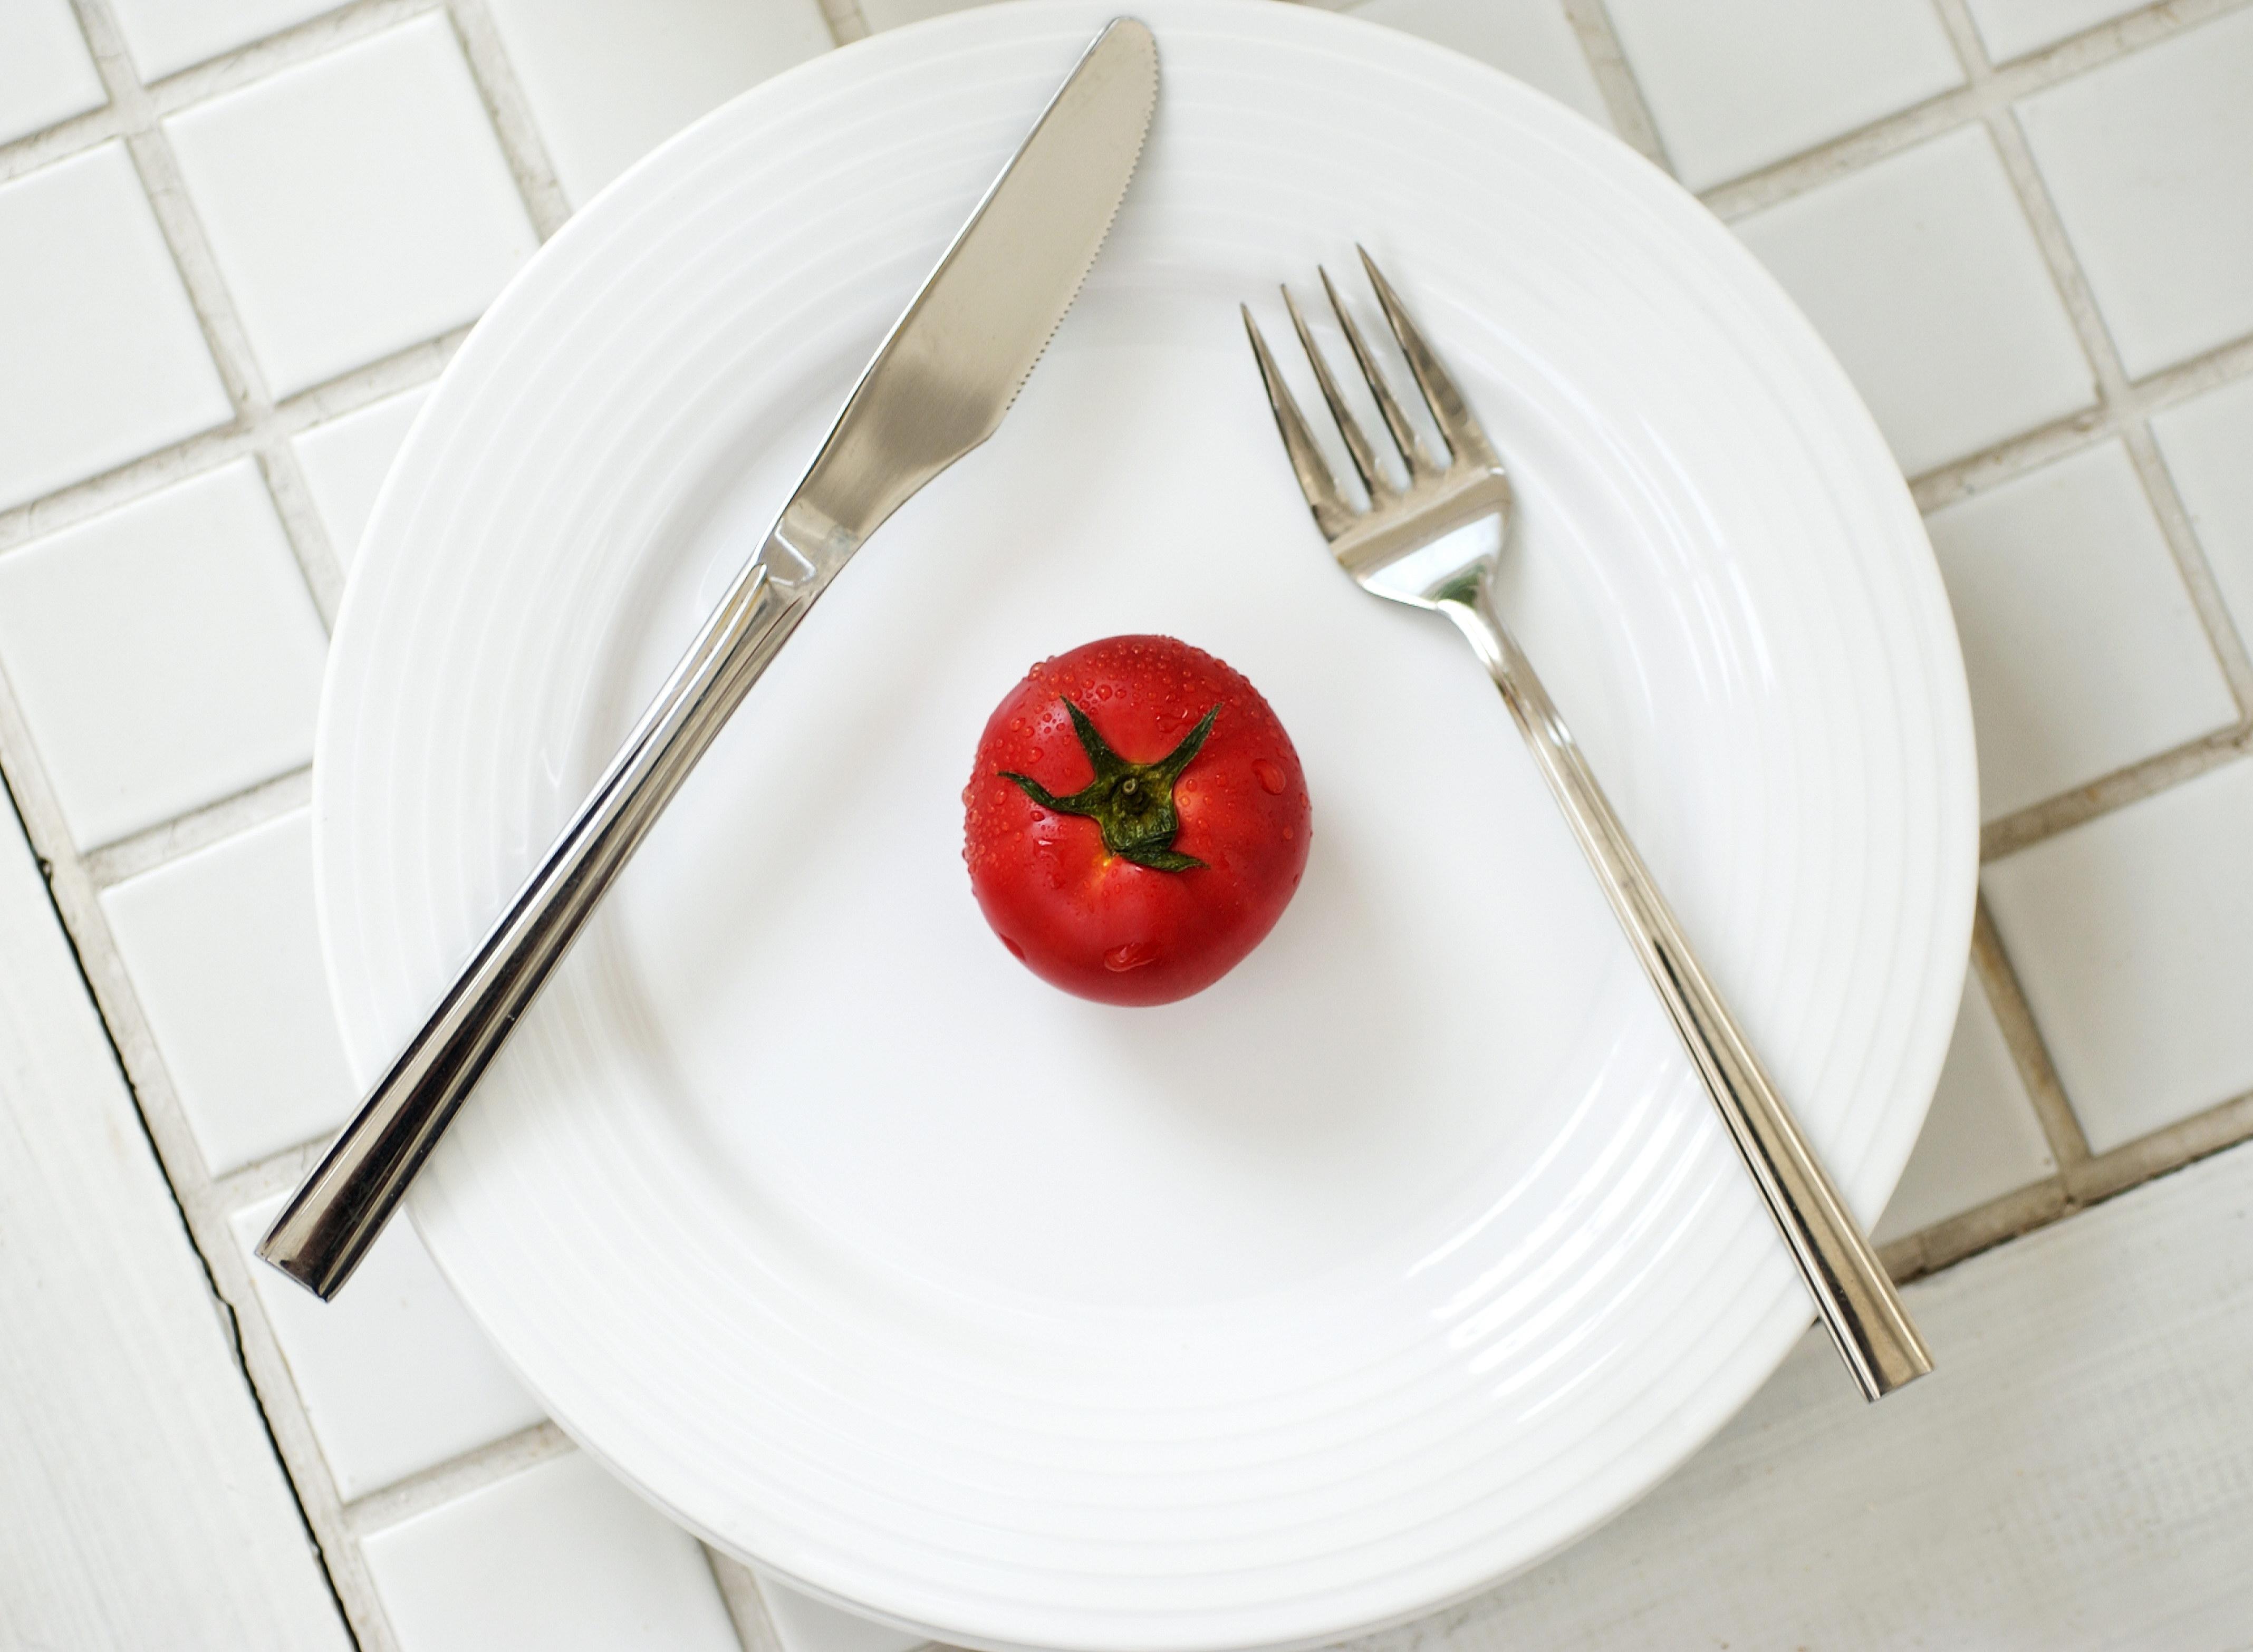 Fondos de pantalla comida minimalismo fruta tenedor plato cuchillo gotas tomate - Cuchillos para decorar fruta ...